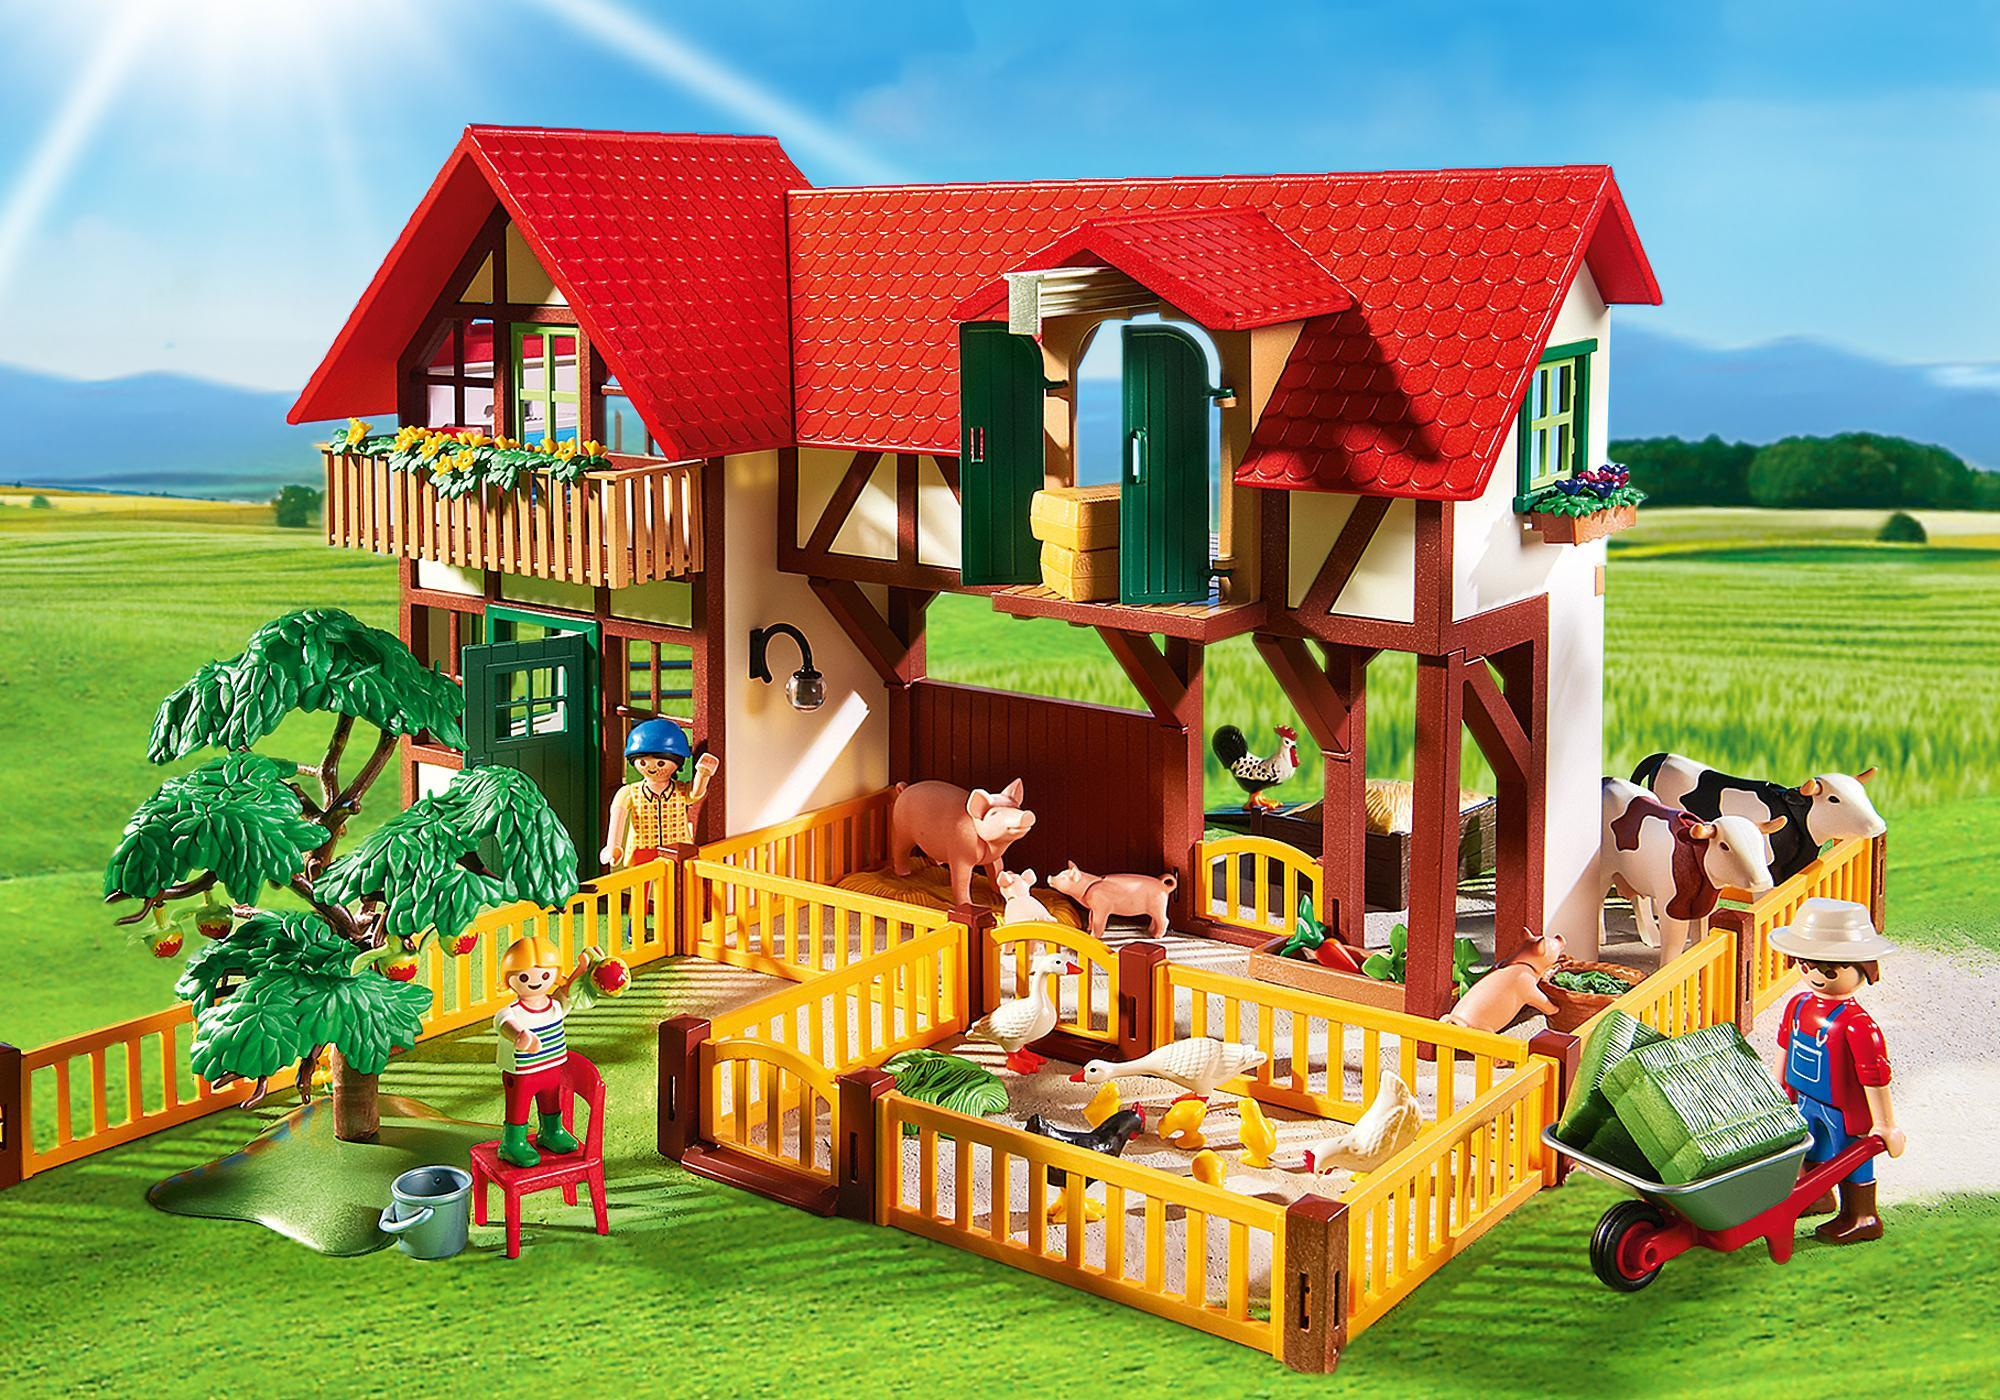 Playmobil Drachenland Ausmalbilder : Playmobil Mal Spielblock Piraten Mal Schablonen Download Images